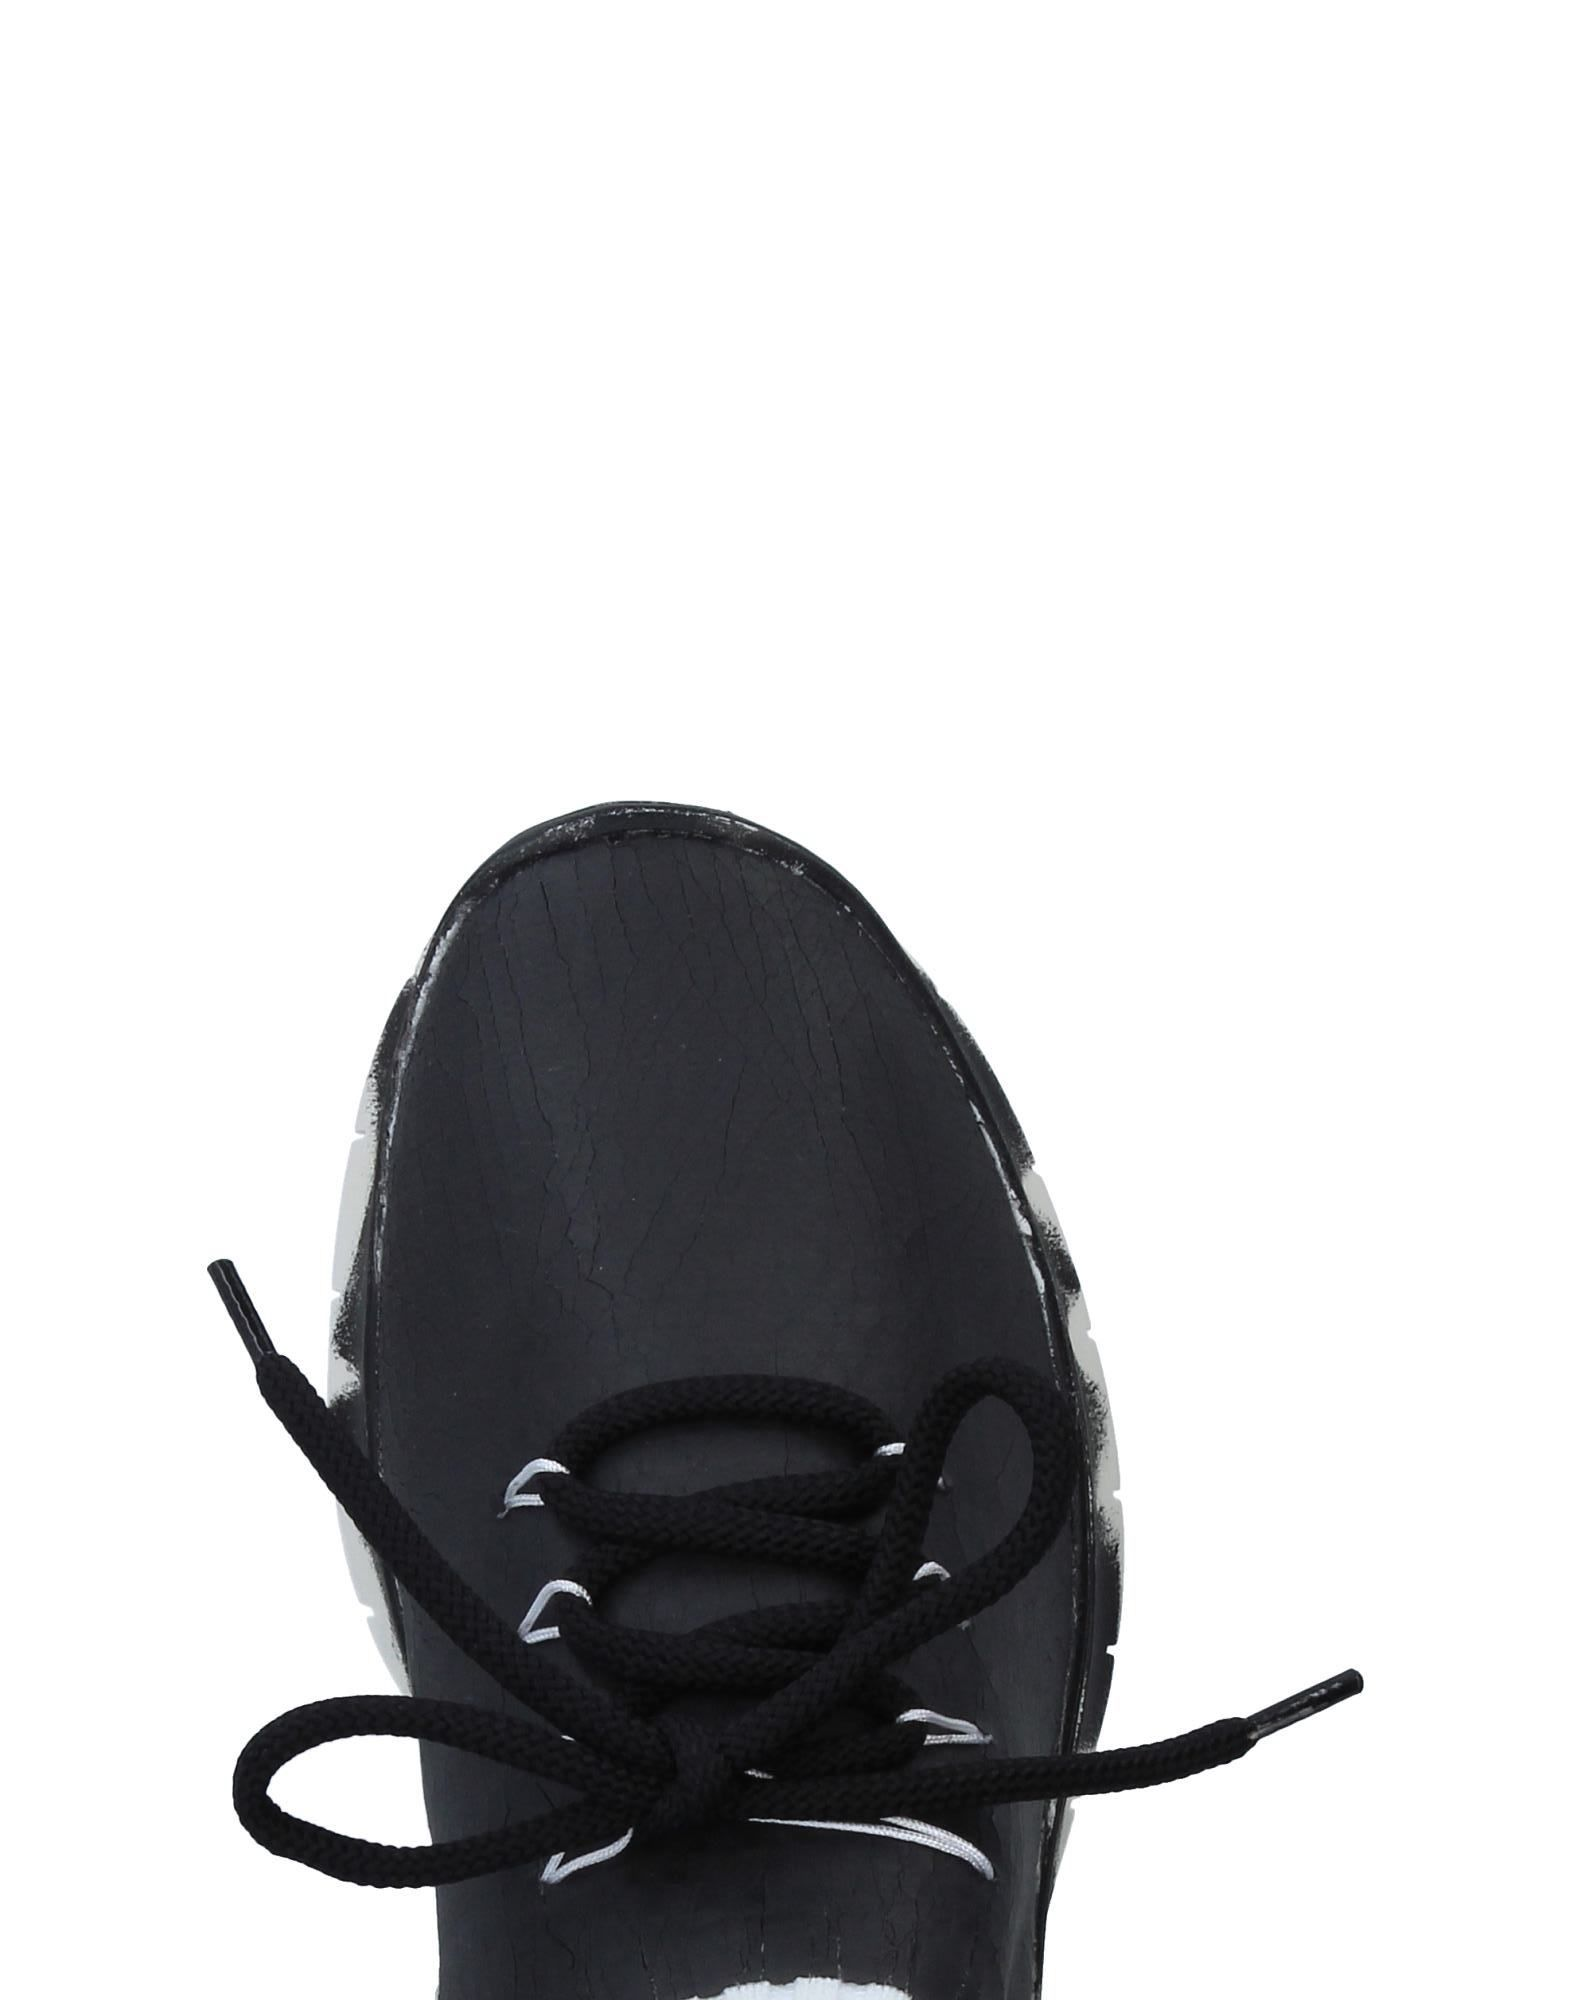 Maison Margiela Margiela Maison Sneakers Herren  11337208TQ Gute Qualität beliebte Schuhe b30669